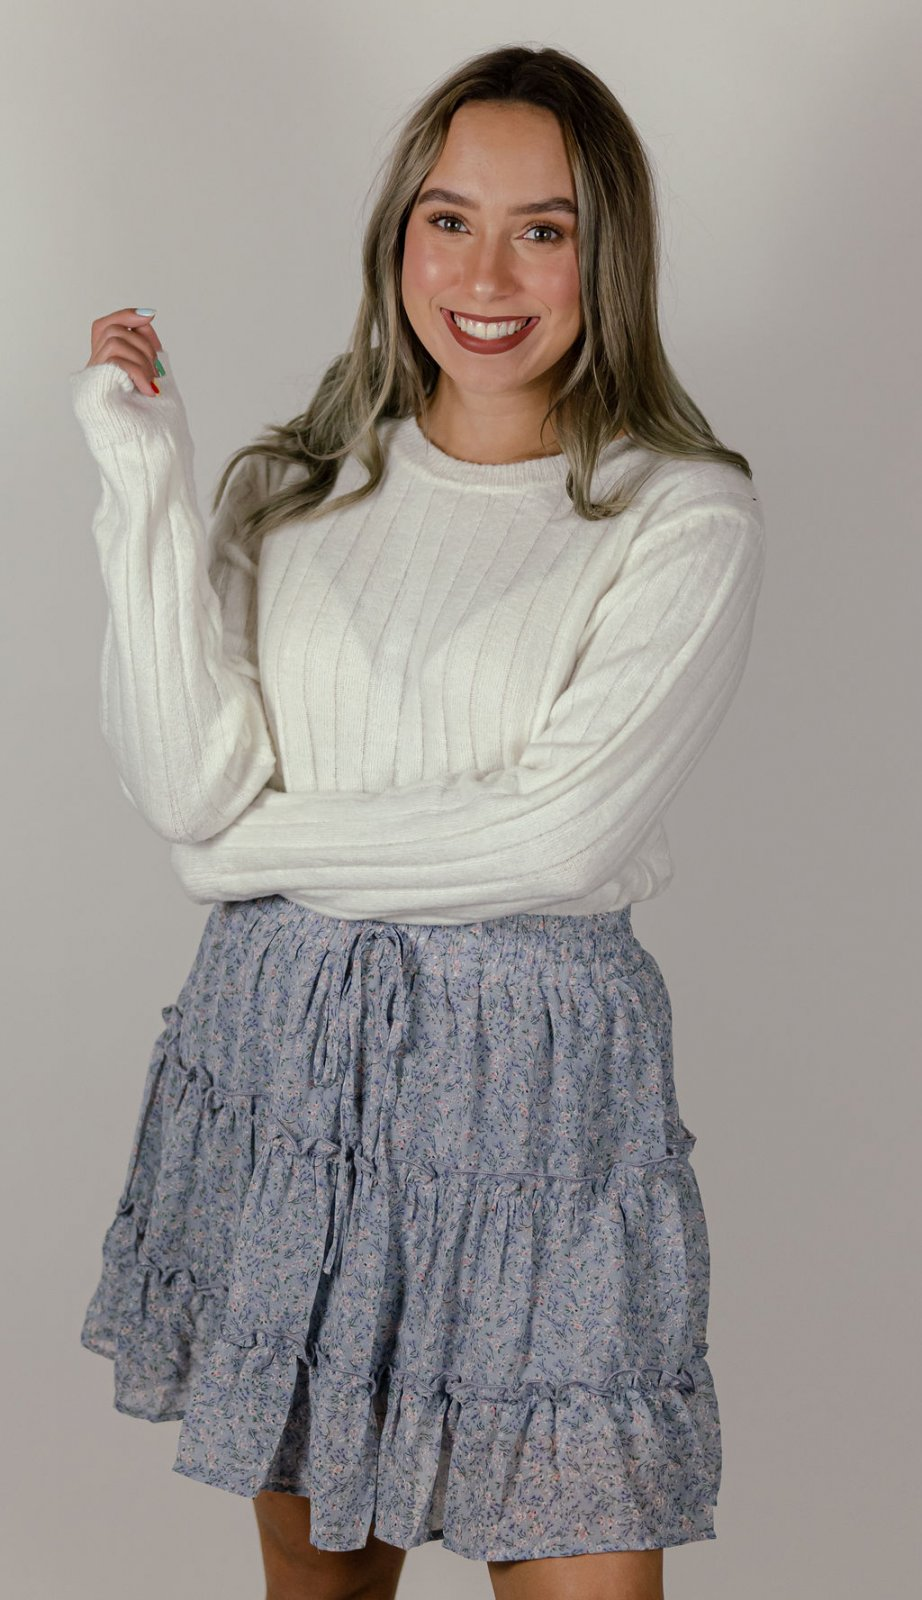 She + Sky Lilac Floral Skirt